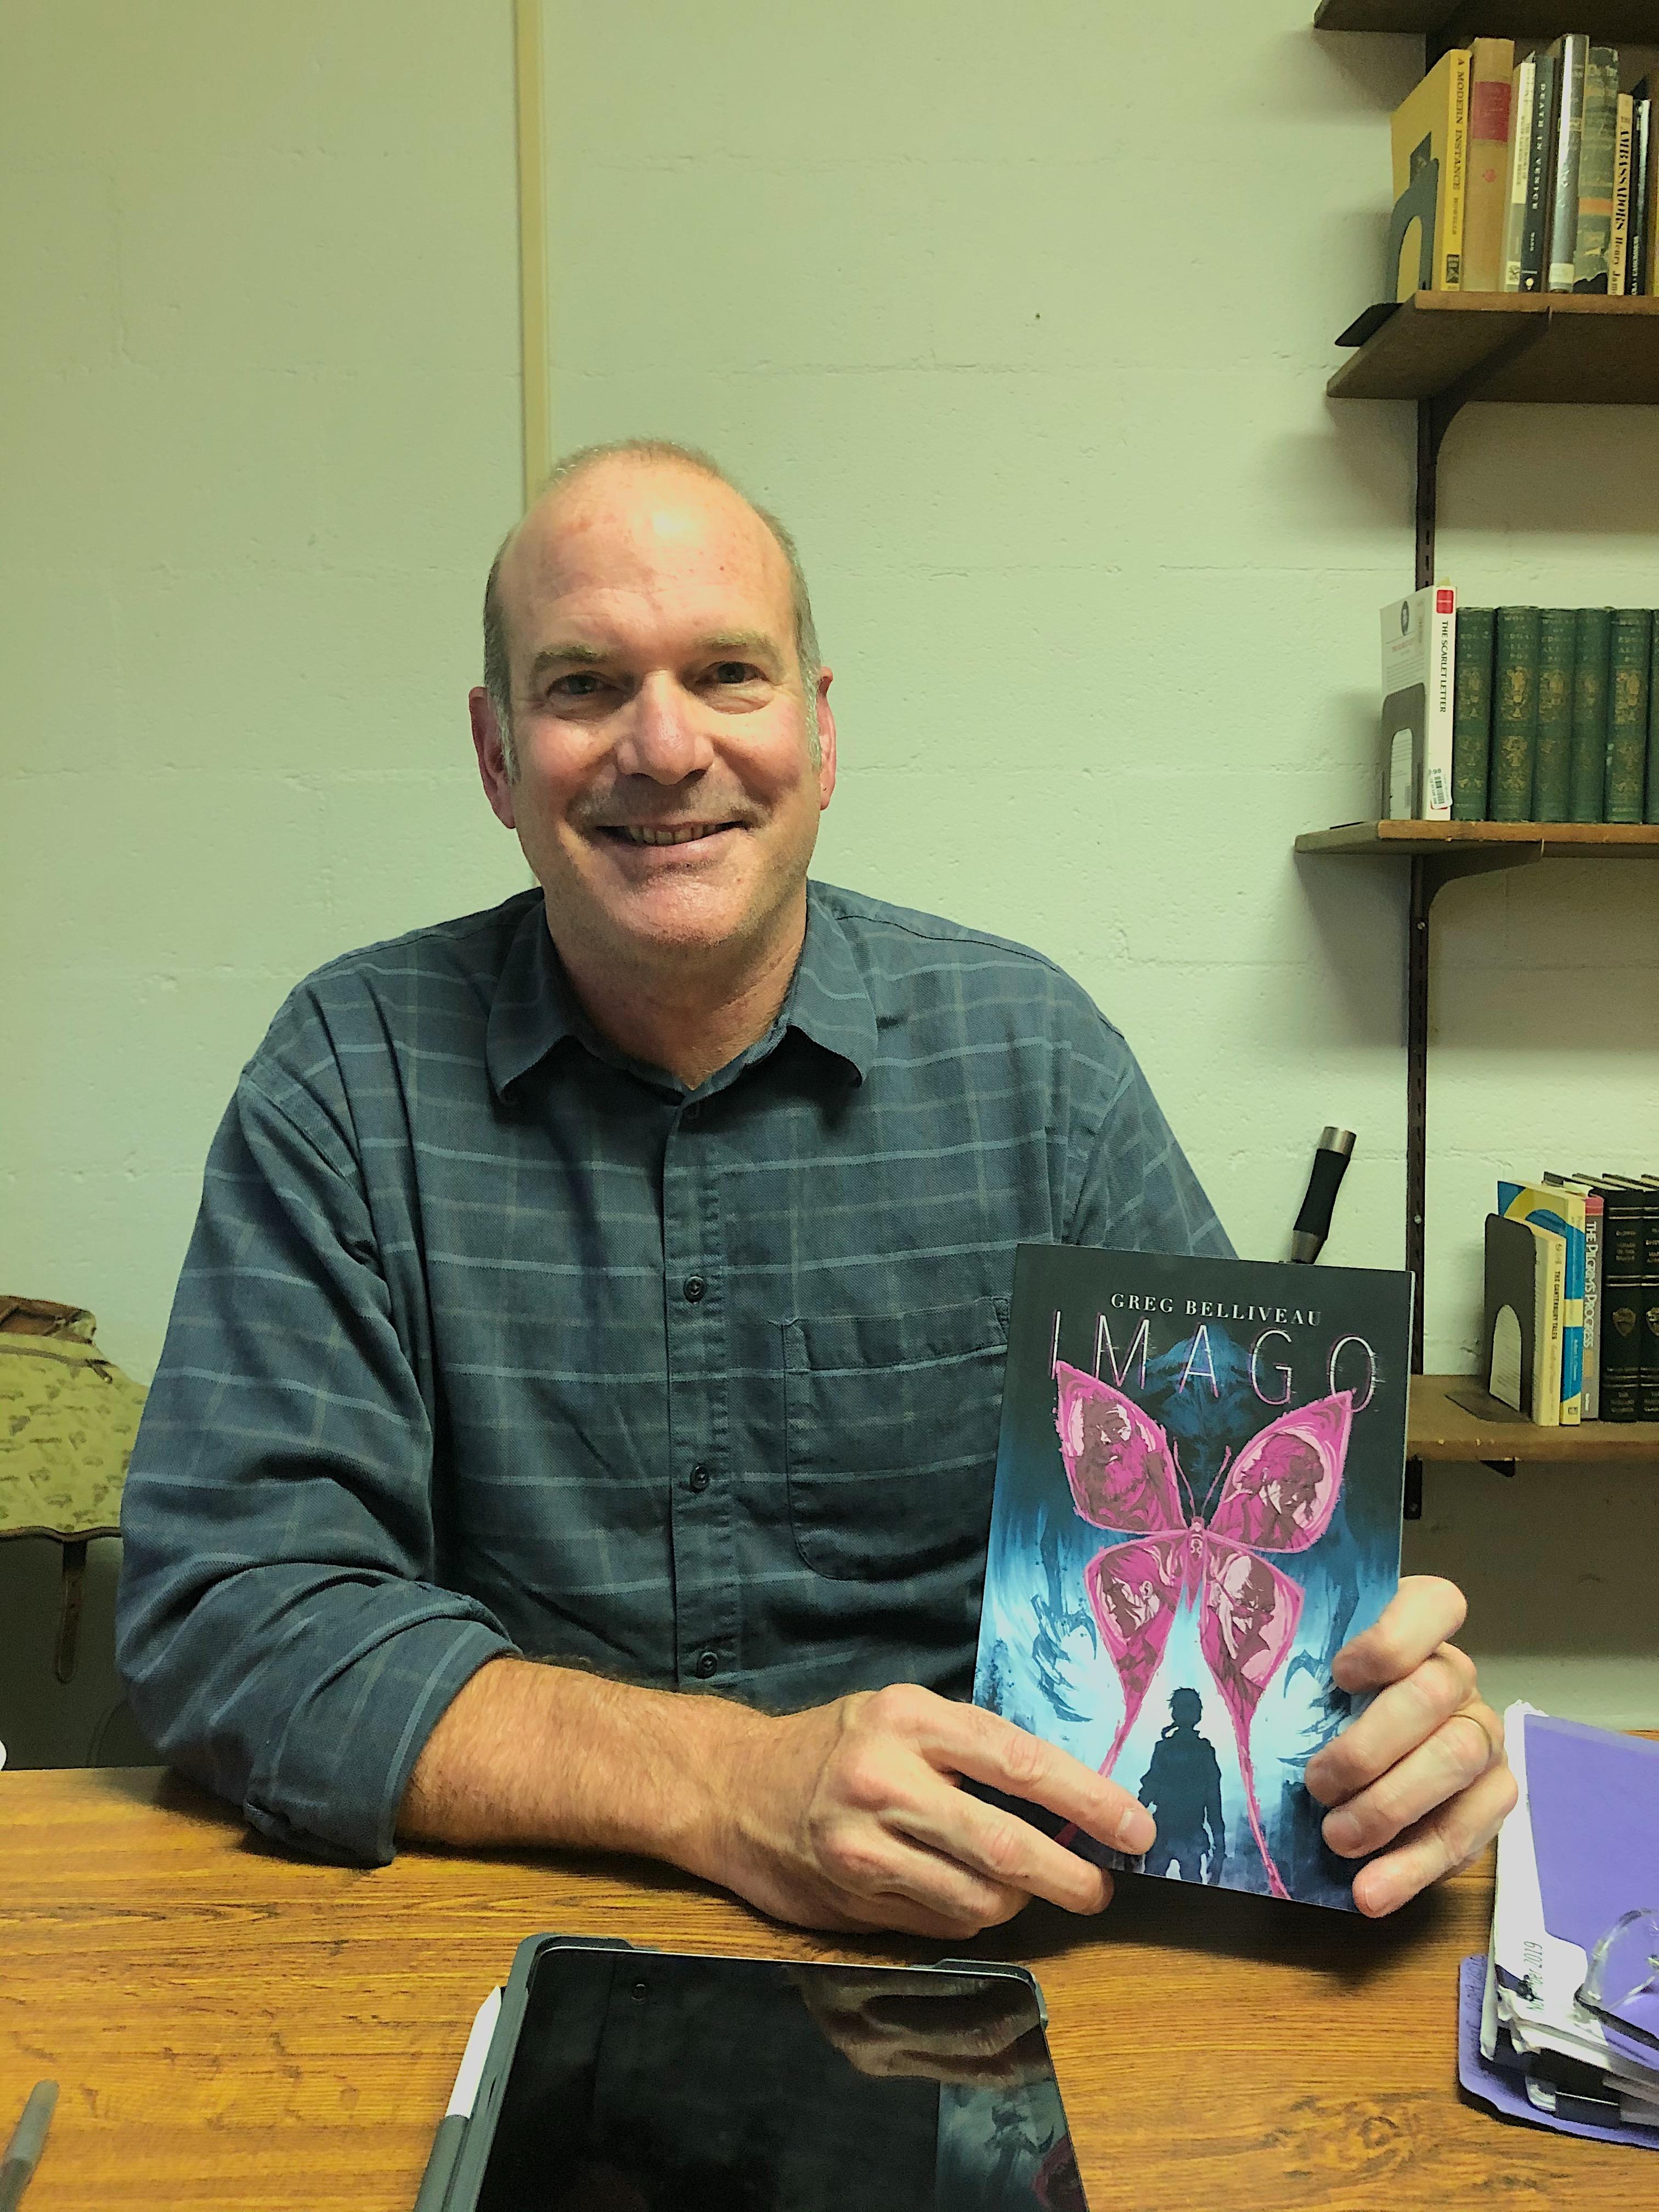 English professor releases sci-fi novel 'IMAGO'